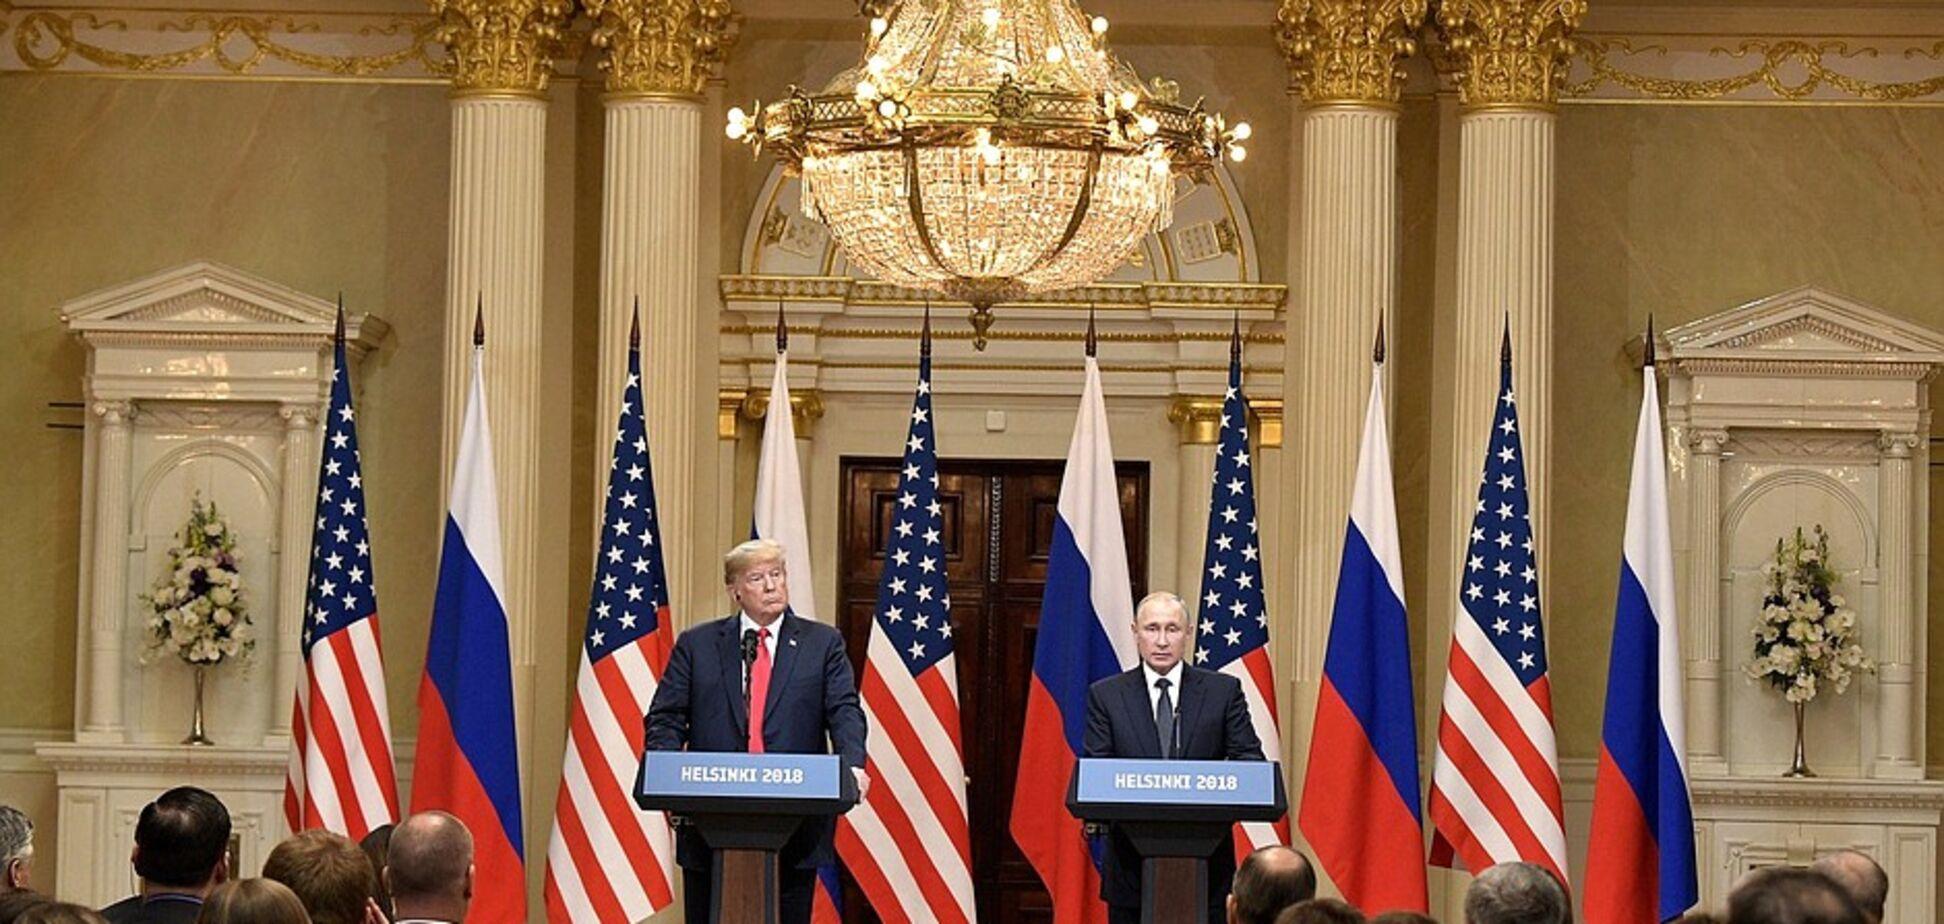 Встреча Путина и Трампа: в Украине подвели итоги